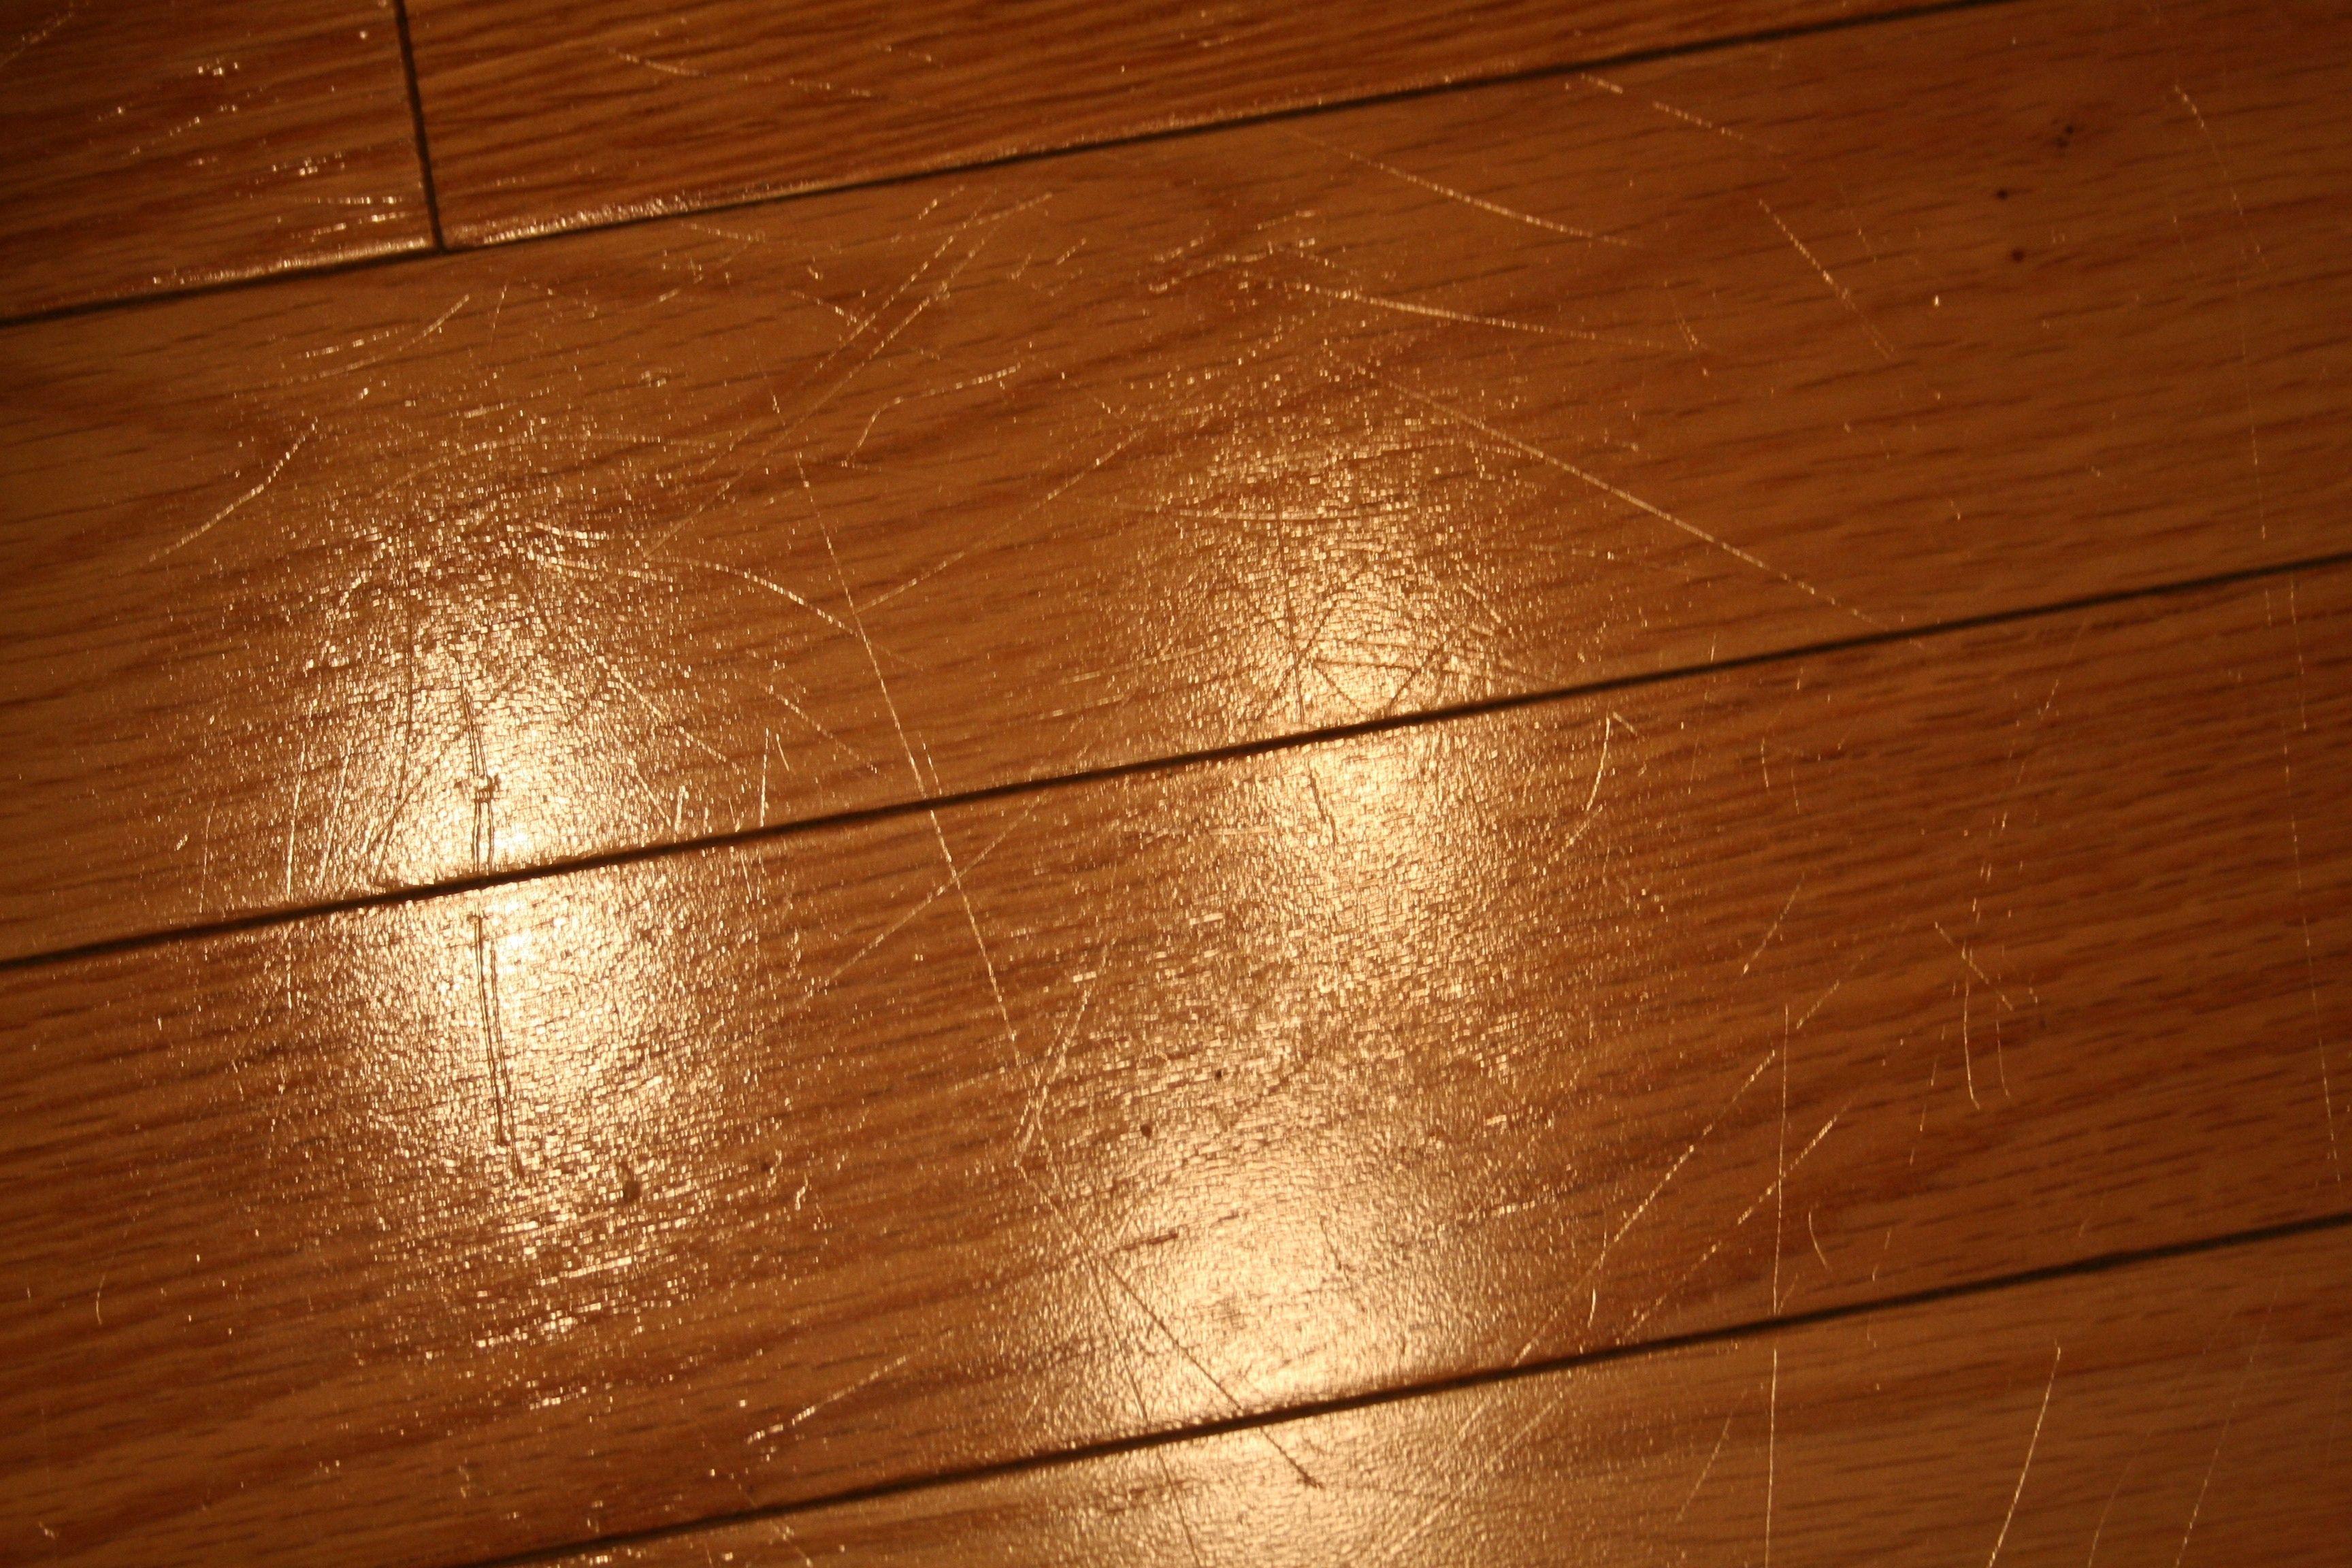 laminate wood exteriors flooring repair floor scratch alberta glo interiors services floors central home ss color